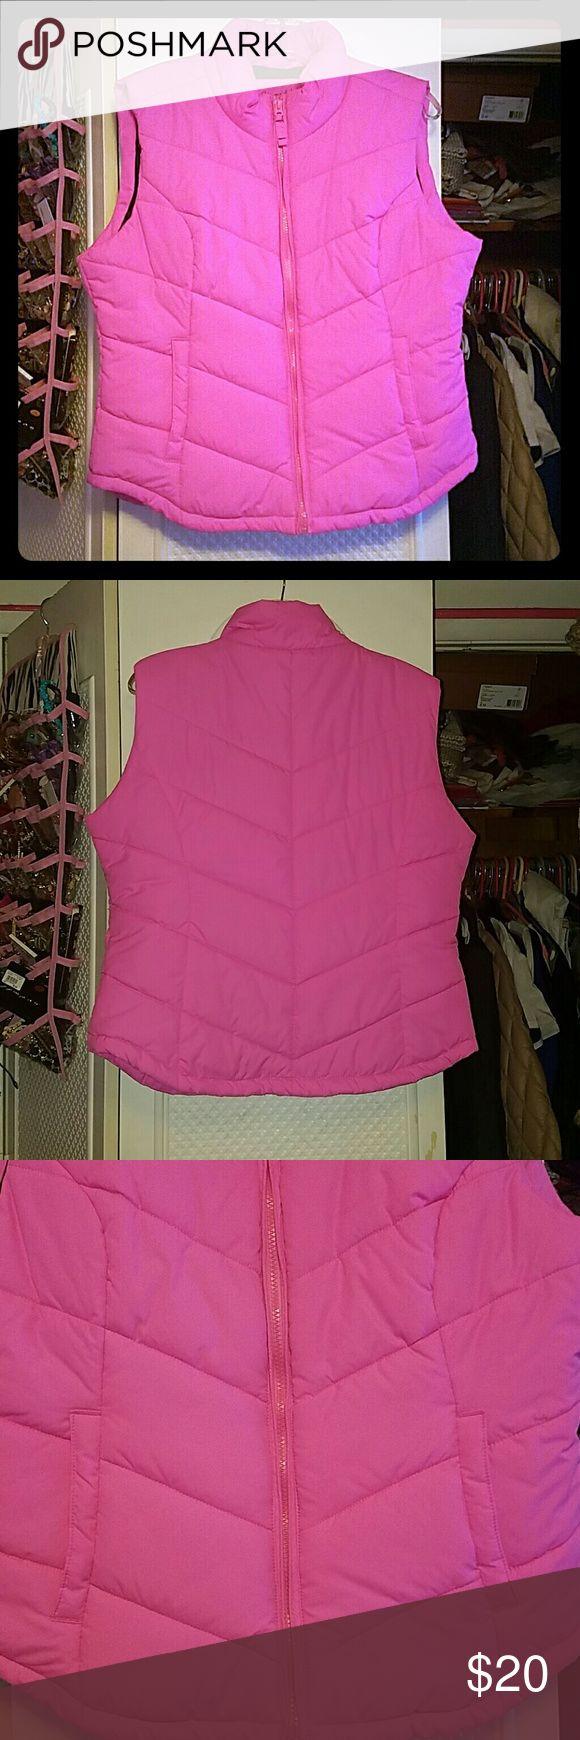 Highlighter Pink Vest Great condition, hardly worn. Aeropostale Jackets & Coats Vests